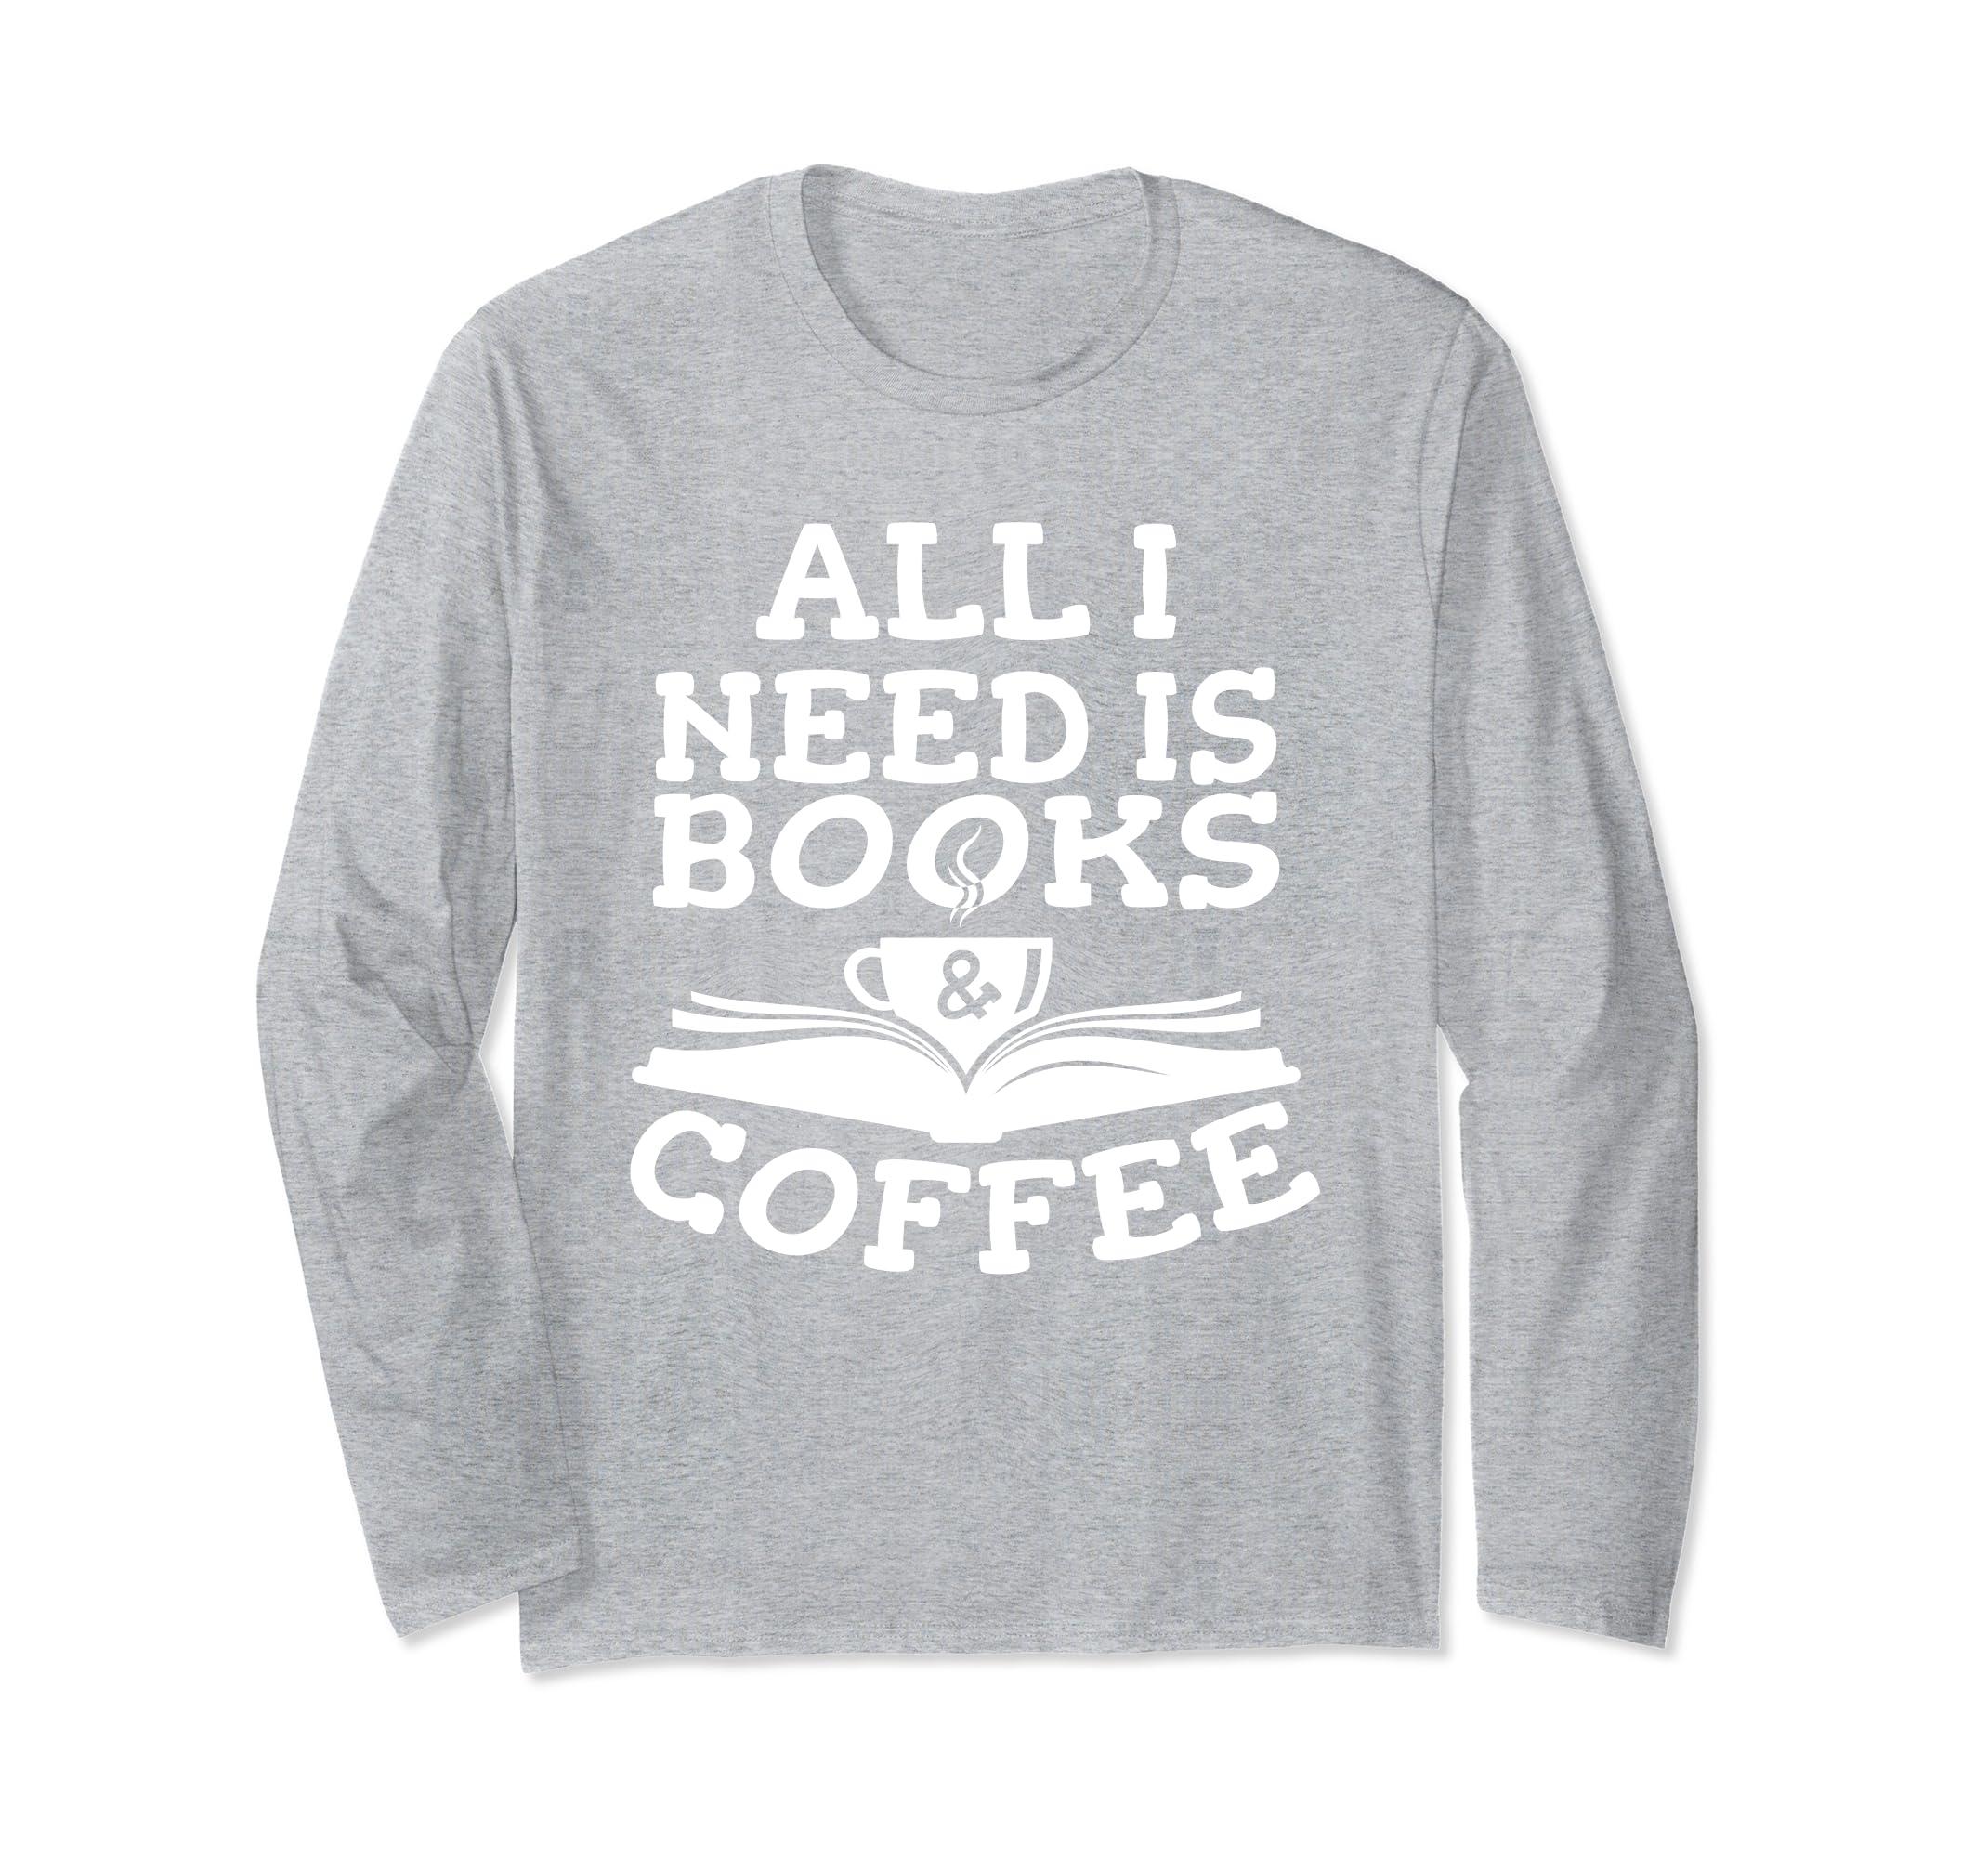 All I Need is Books & Coffee Long Sleeve T Shirt-ln